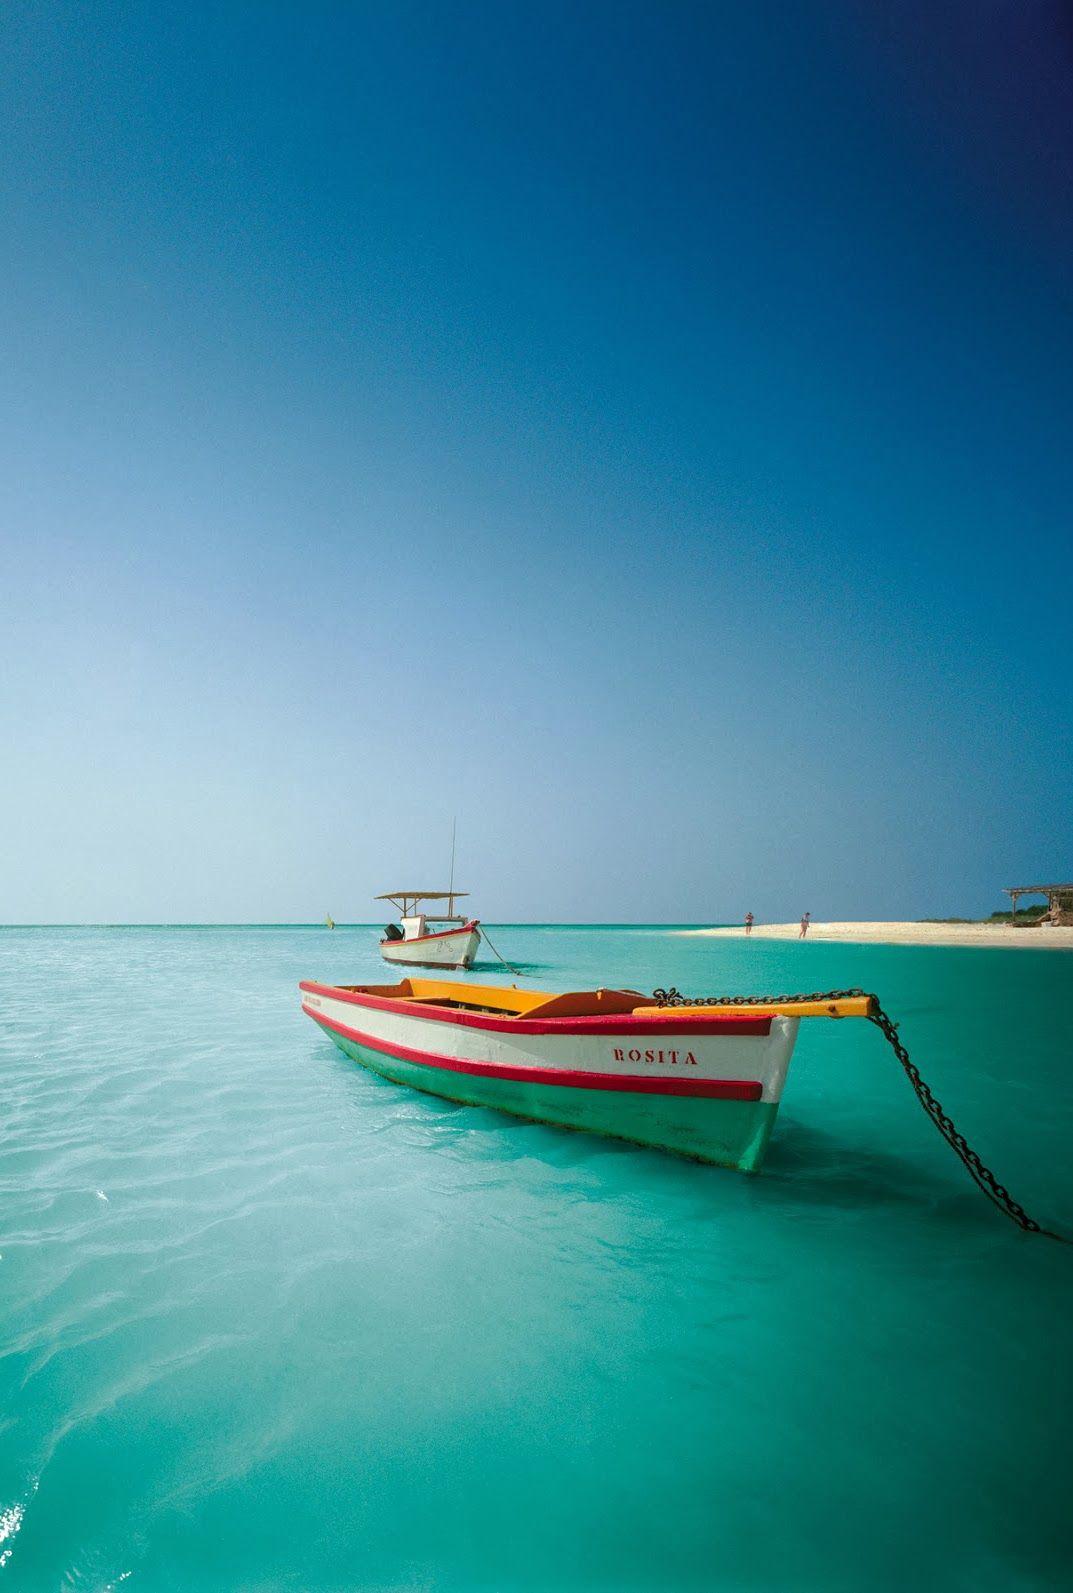 Aruba, Caribbean: